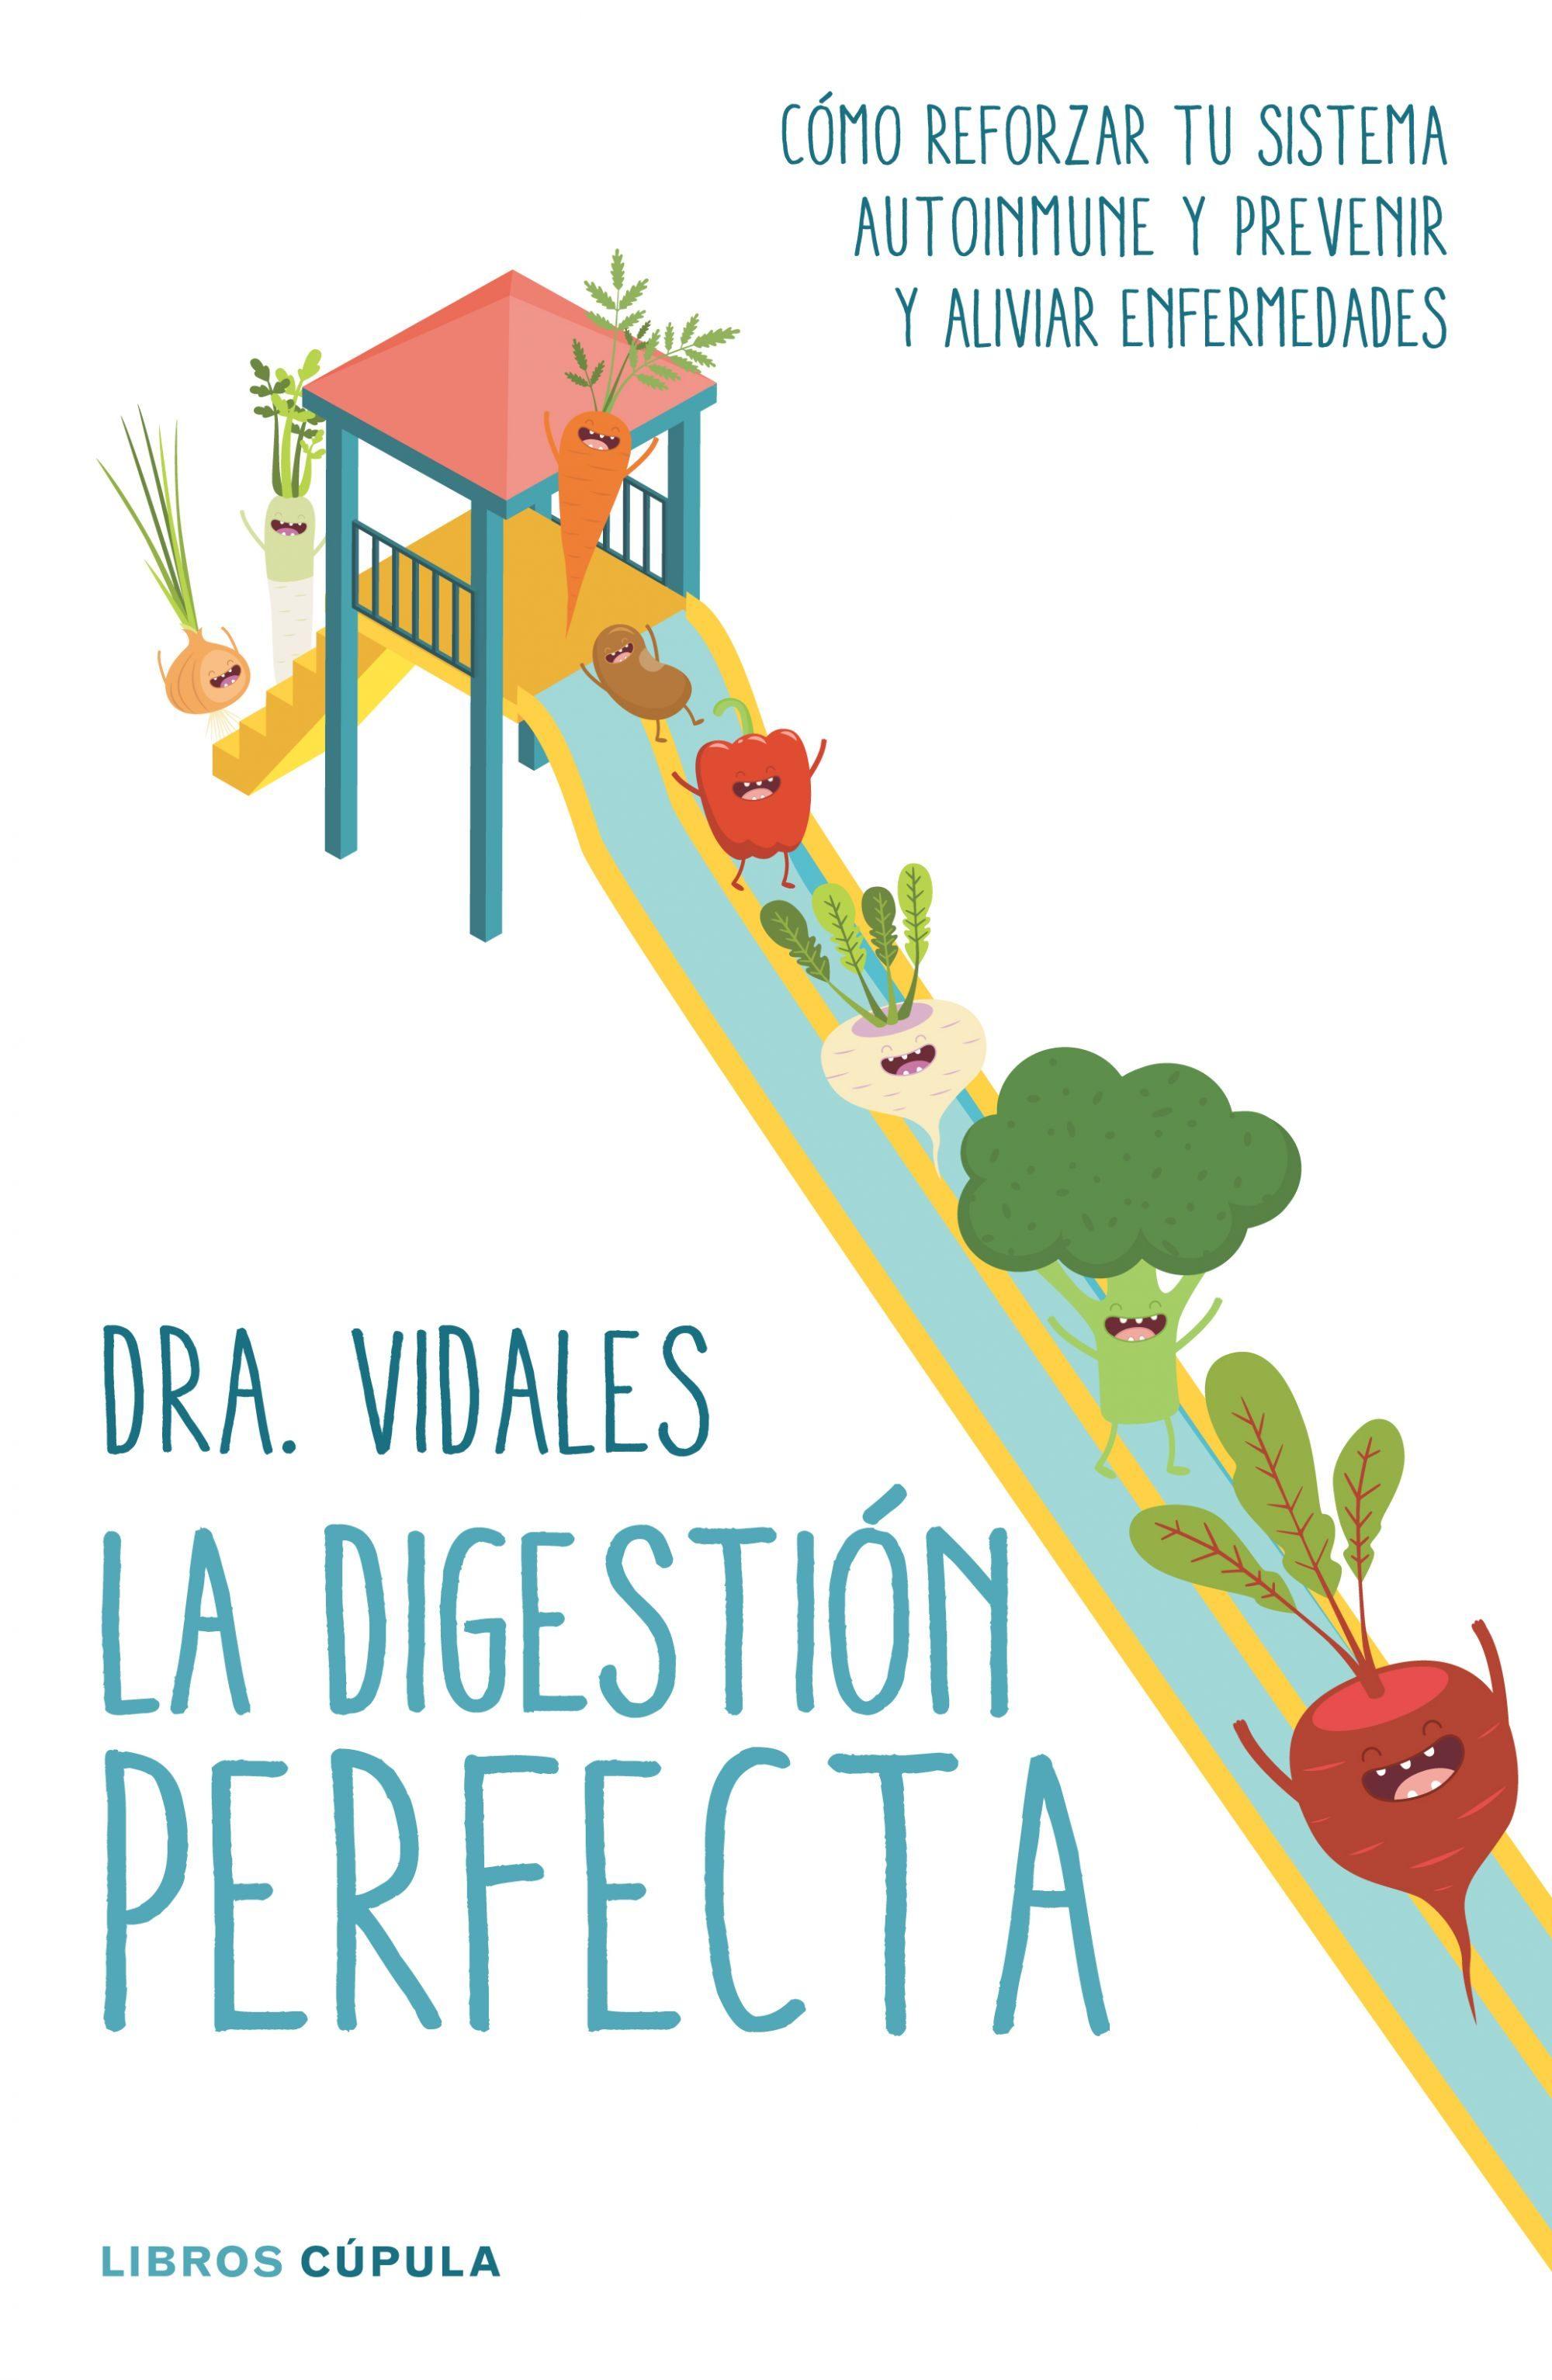 La digestión perfecta (Dra. Vidales)